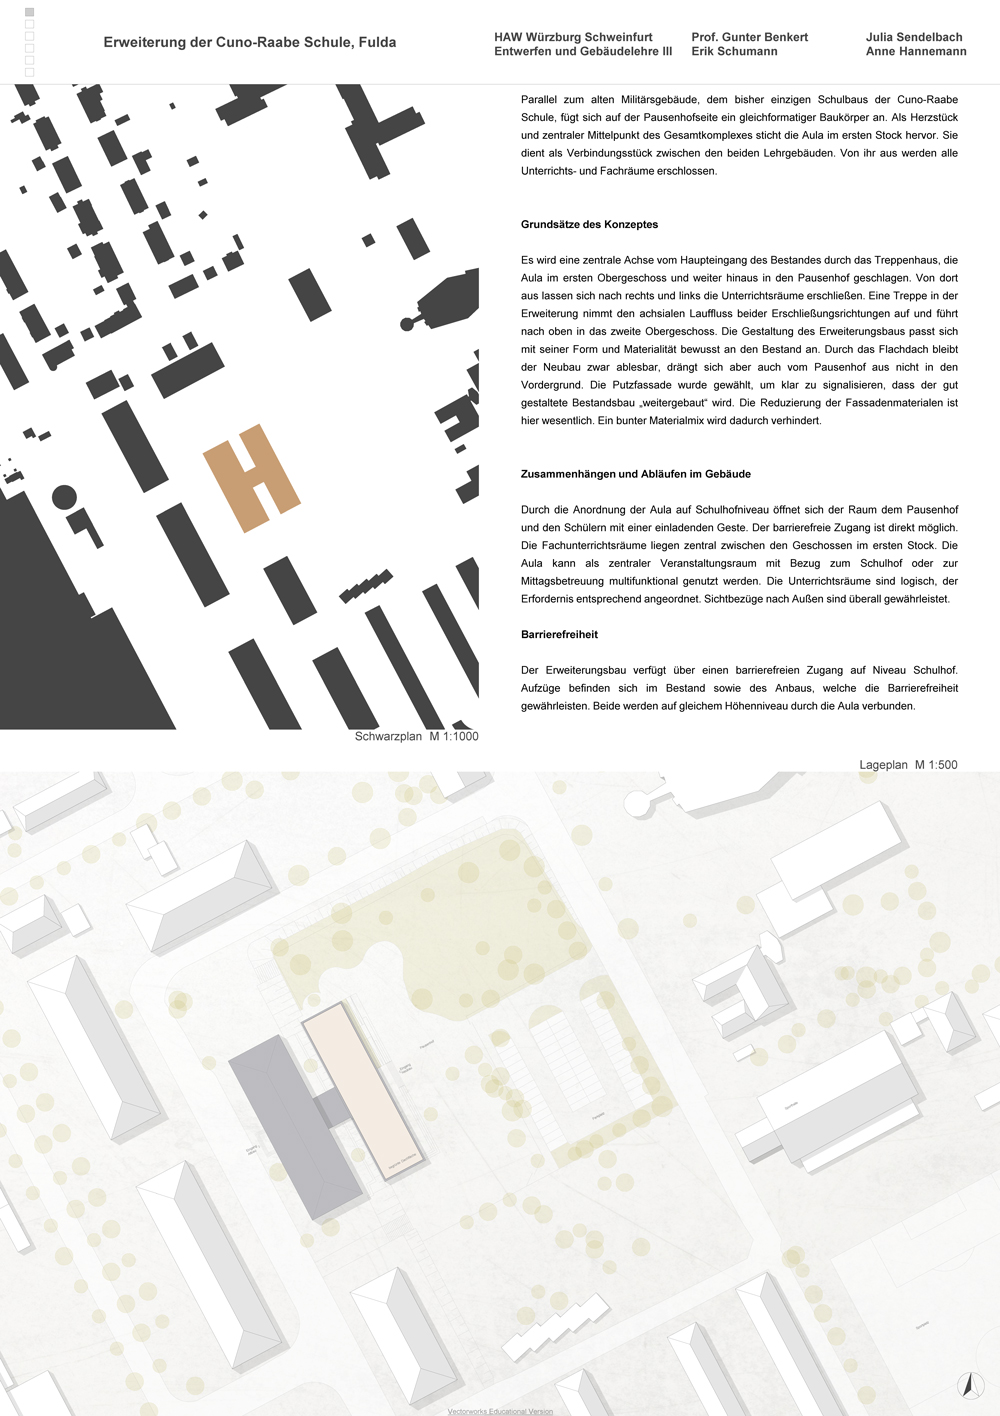 Sendelbach_Hannemann_Plan1